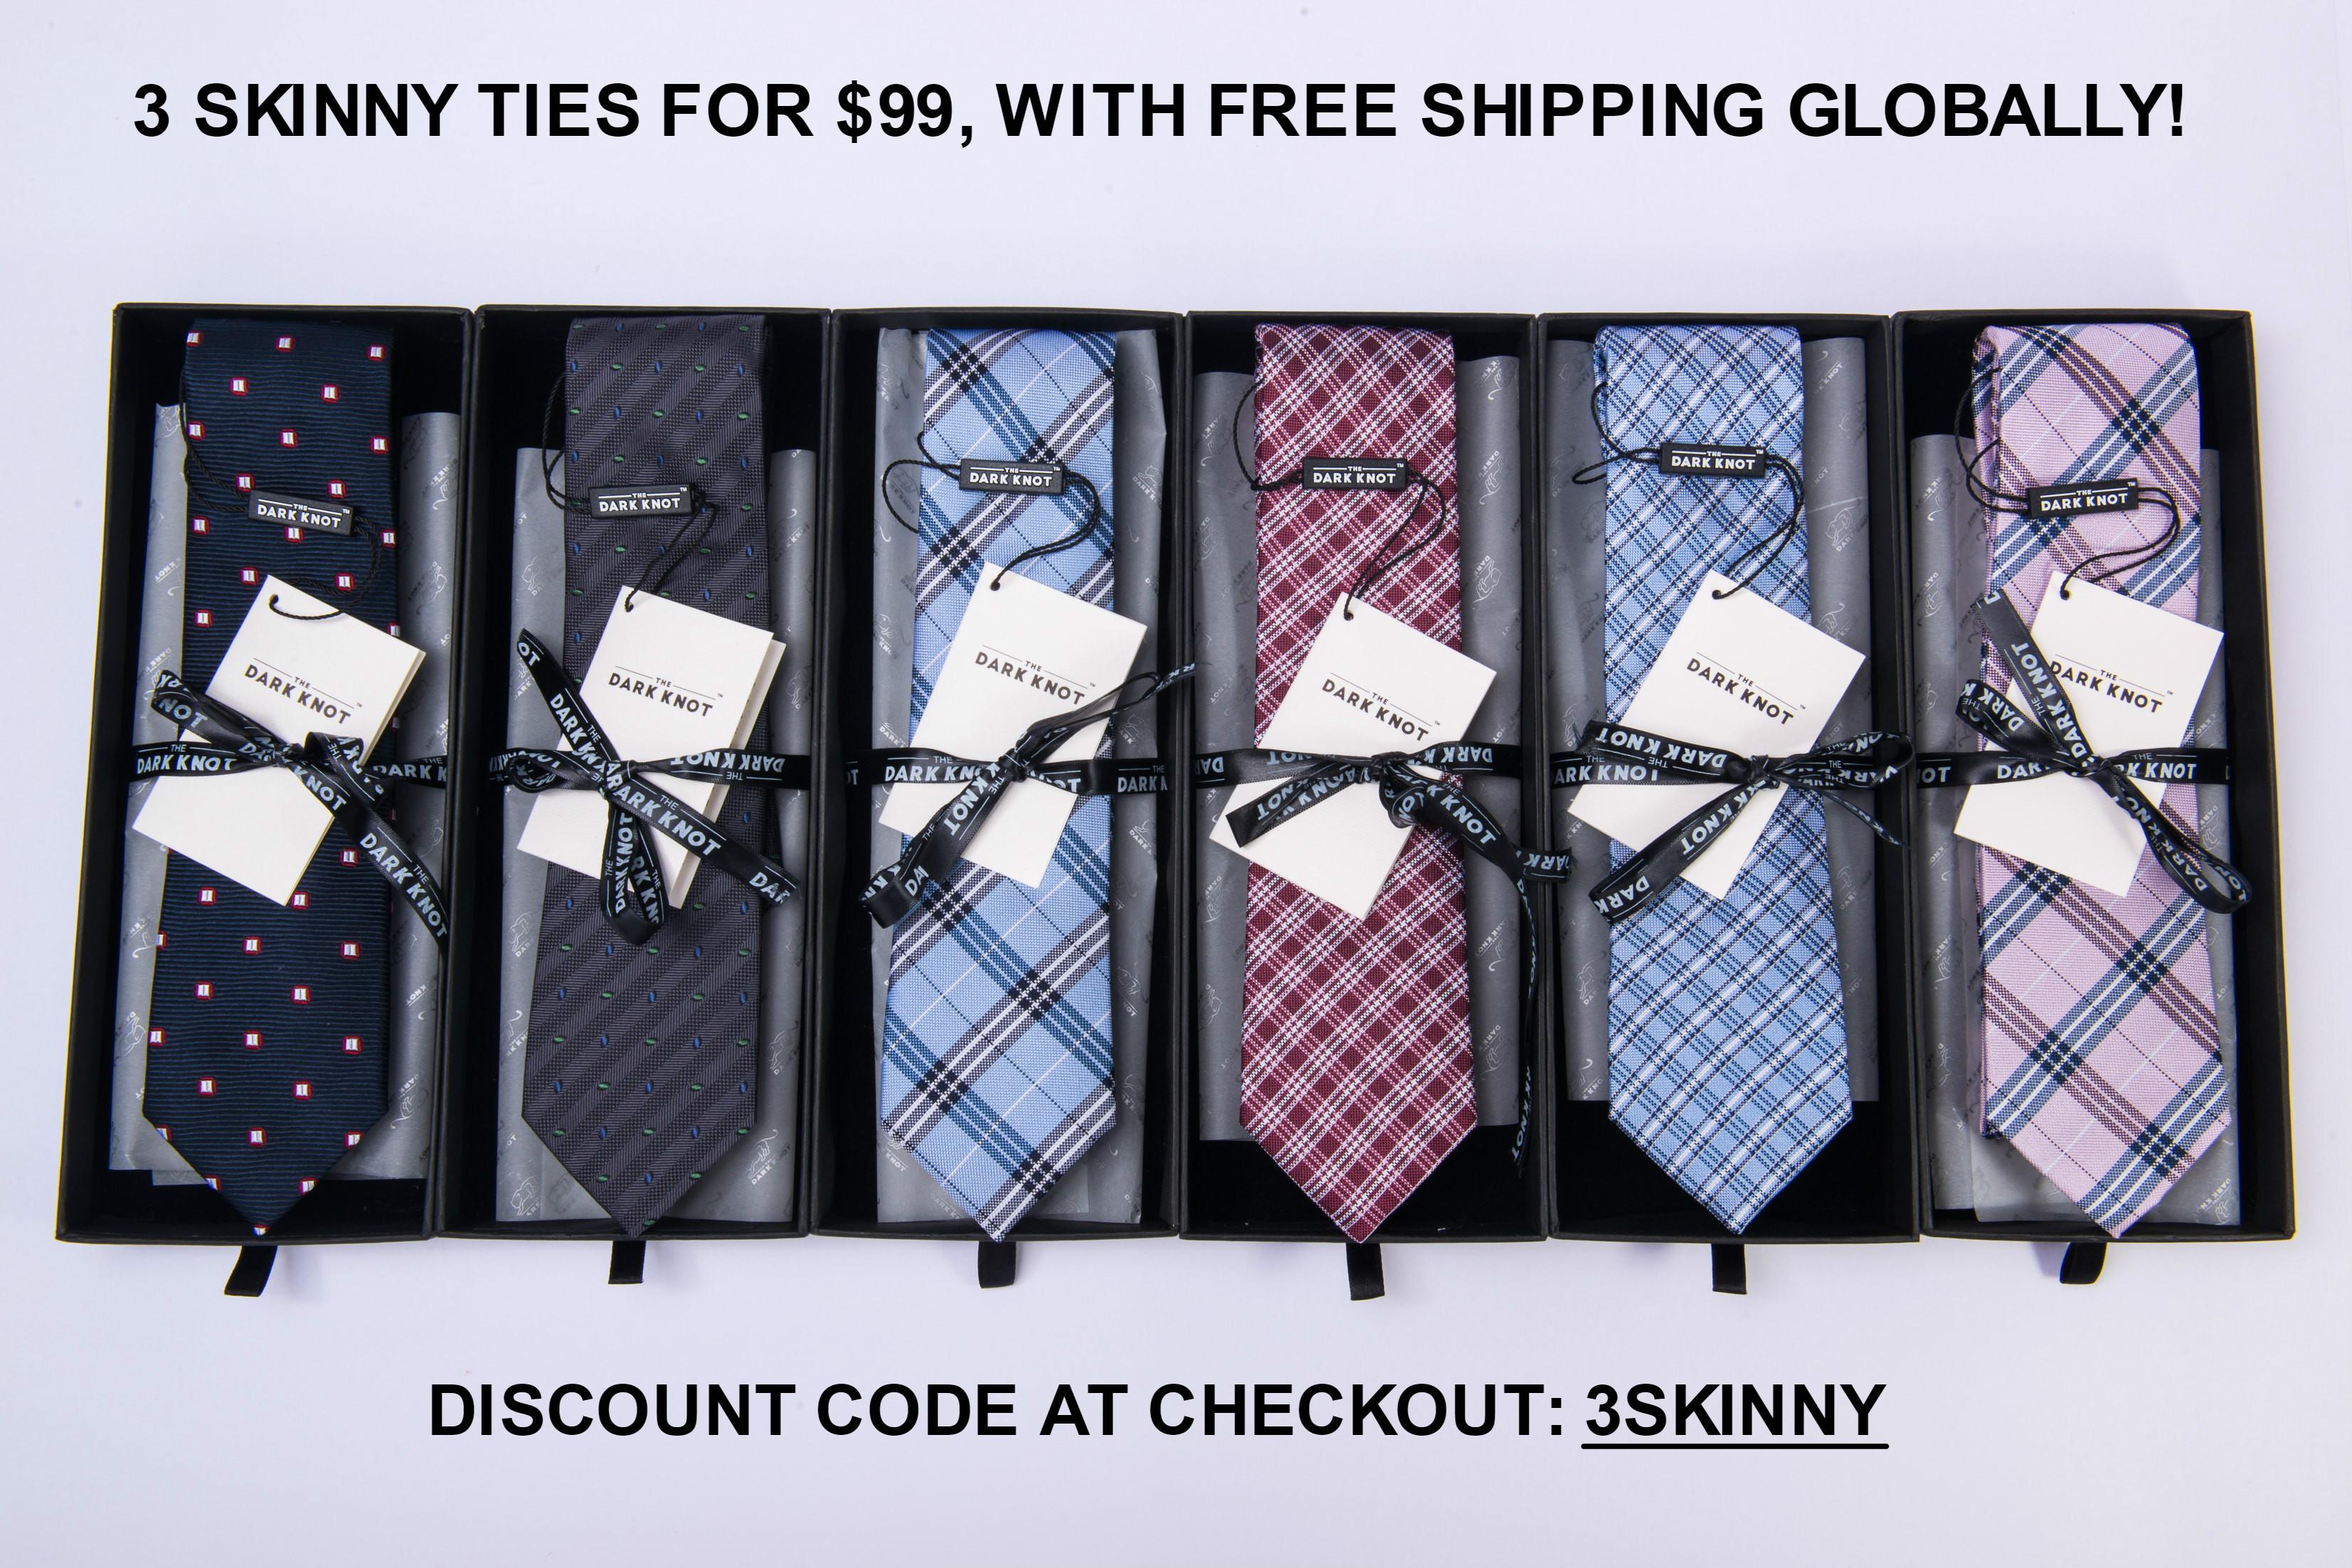 Skinny Tie Special Deal